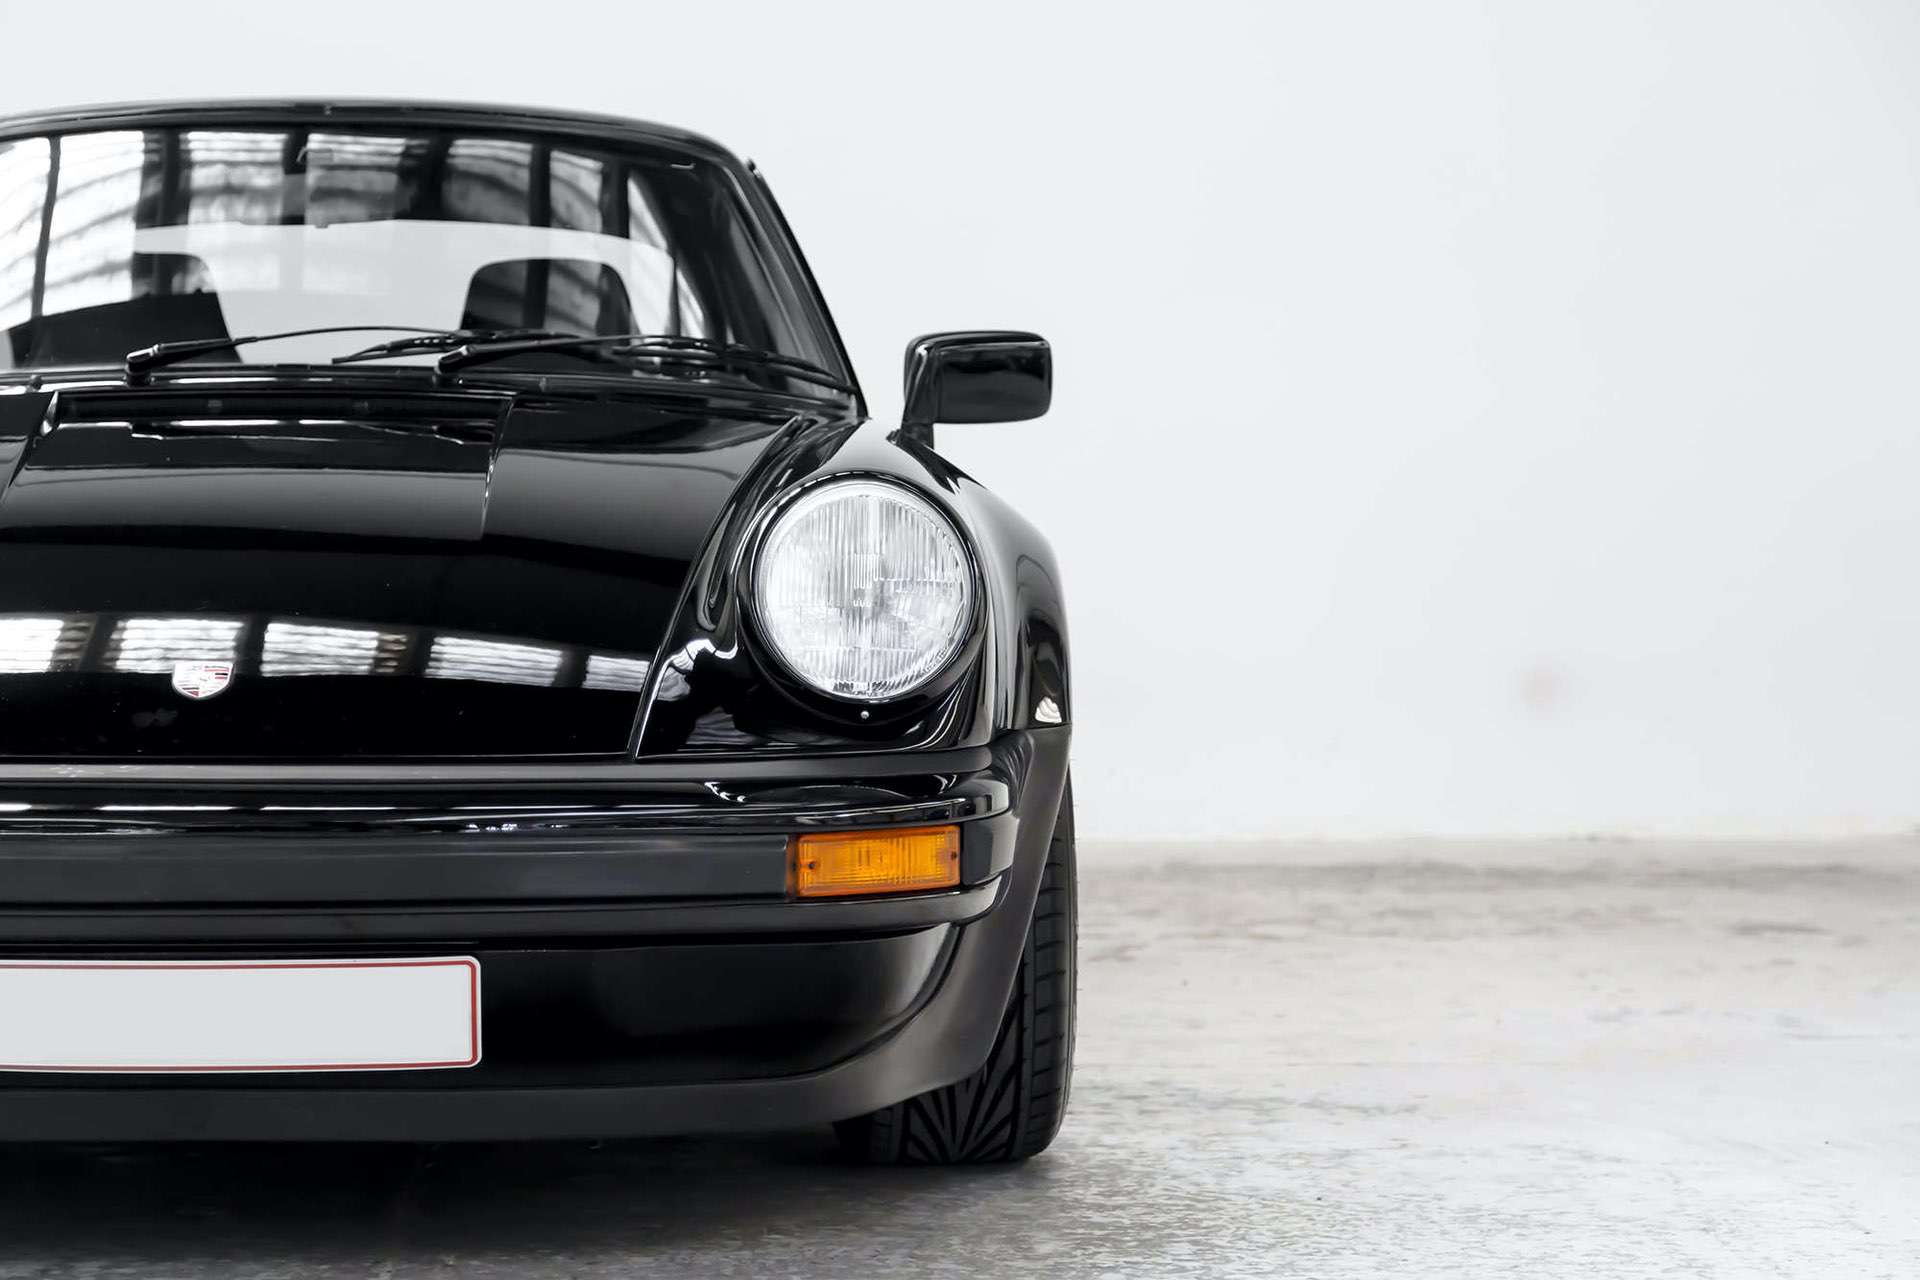 Porsche_911_930_Turbo_0011